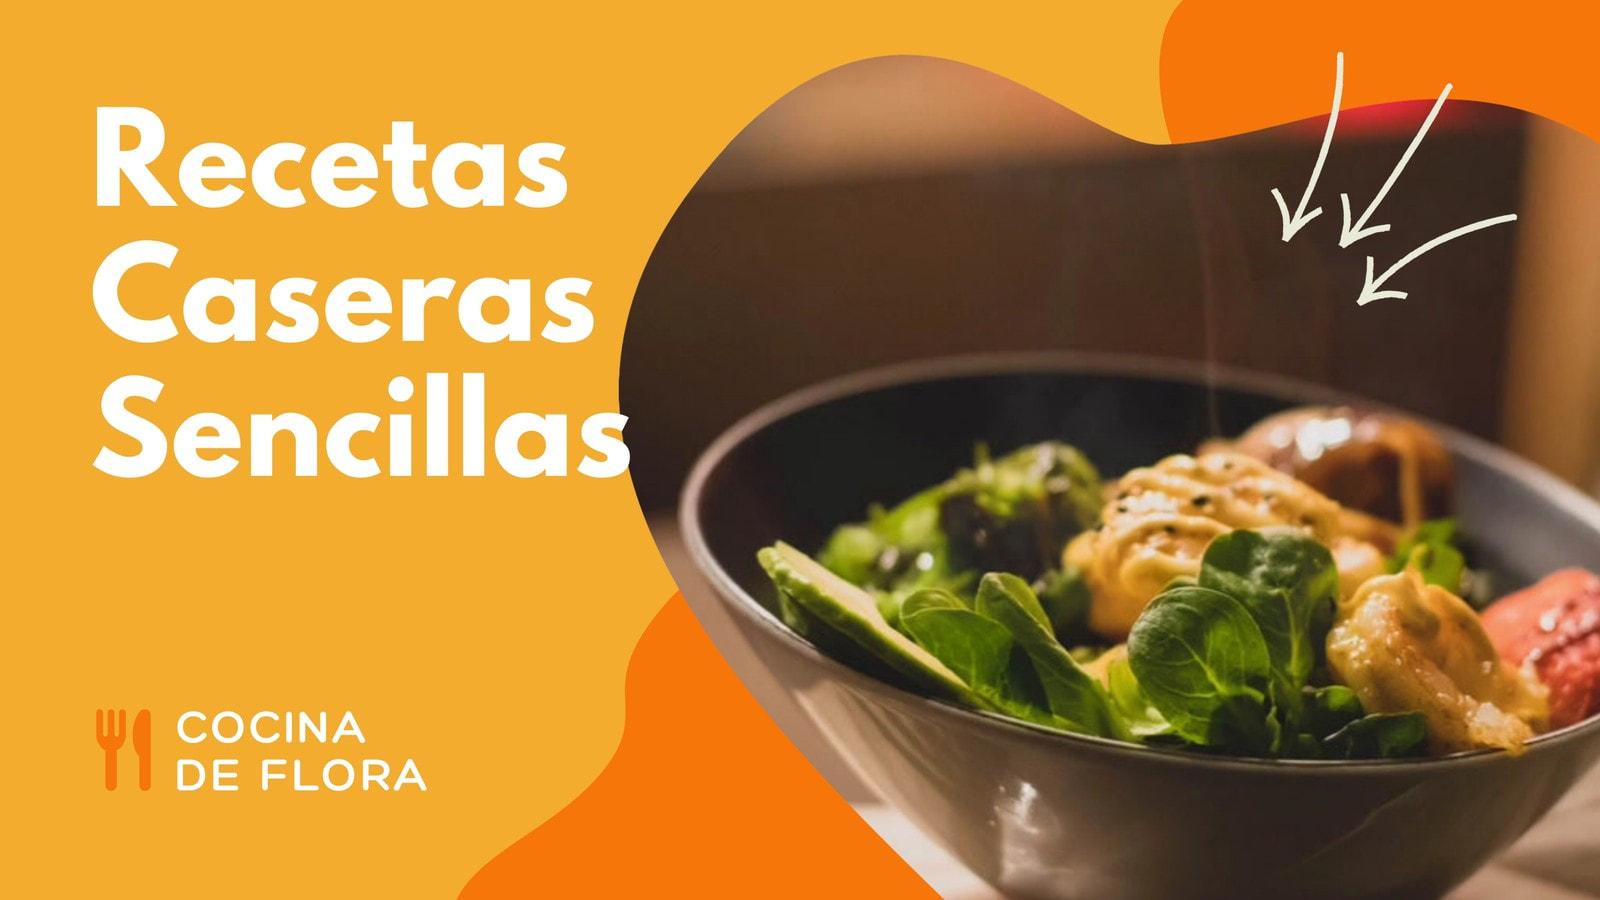 Naranja Blanco Sencillo Comida Casera Empresa/Restaurante Vídeo 16:9